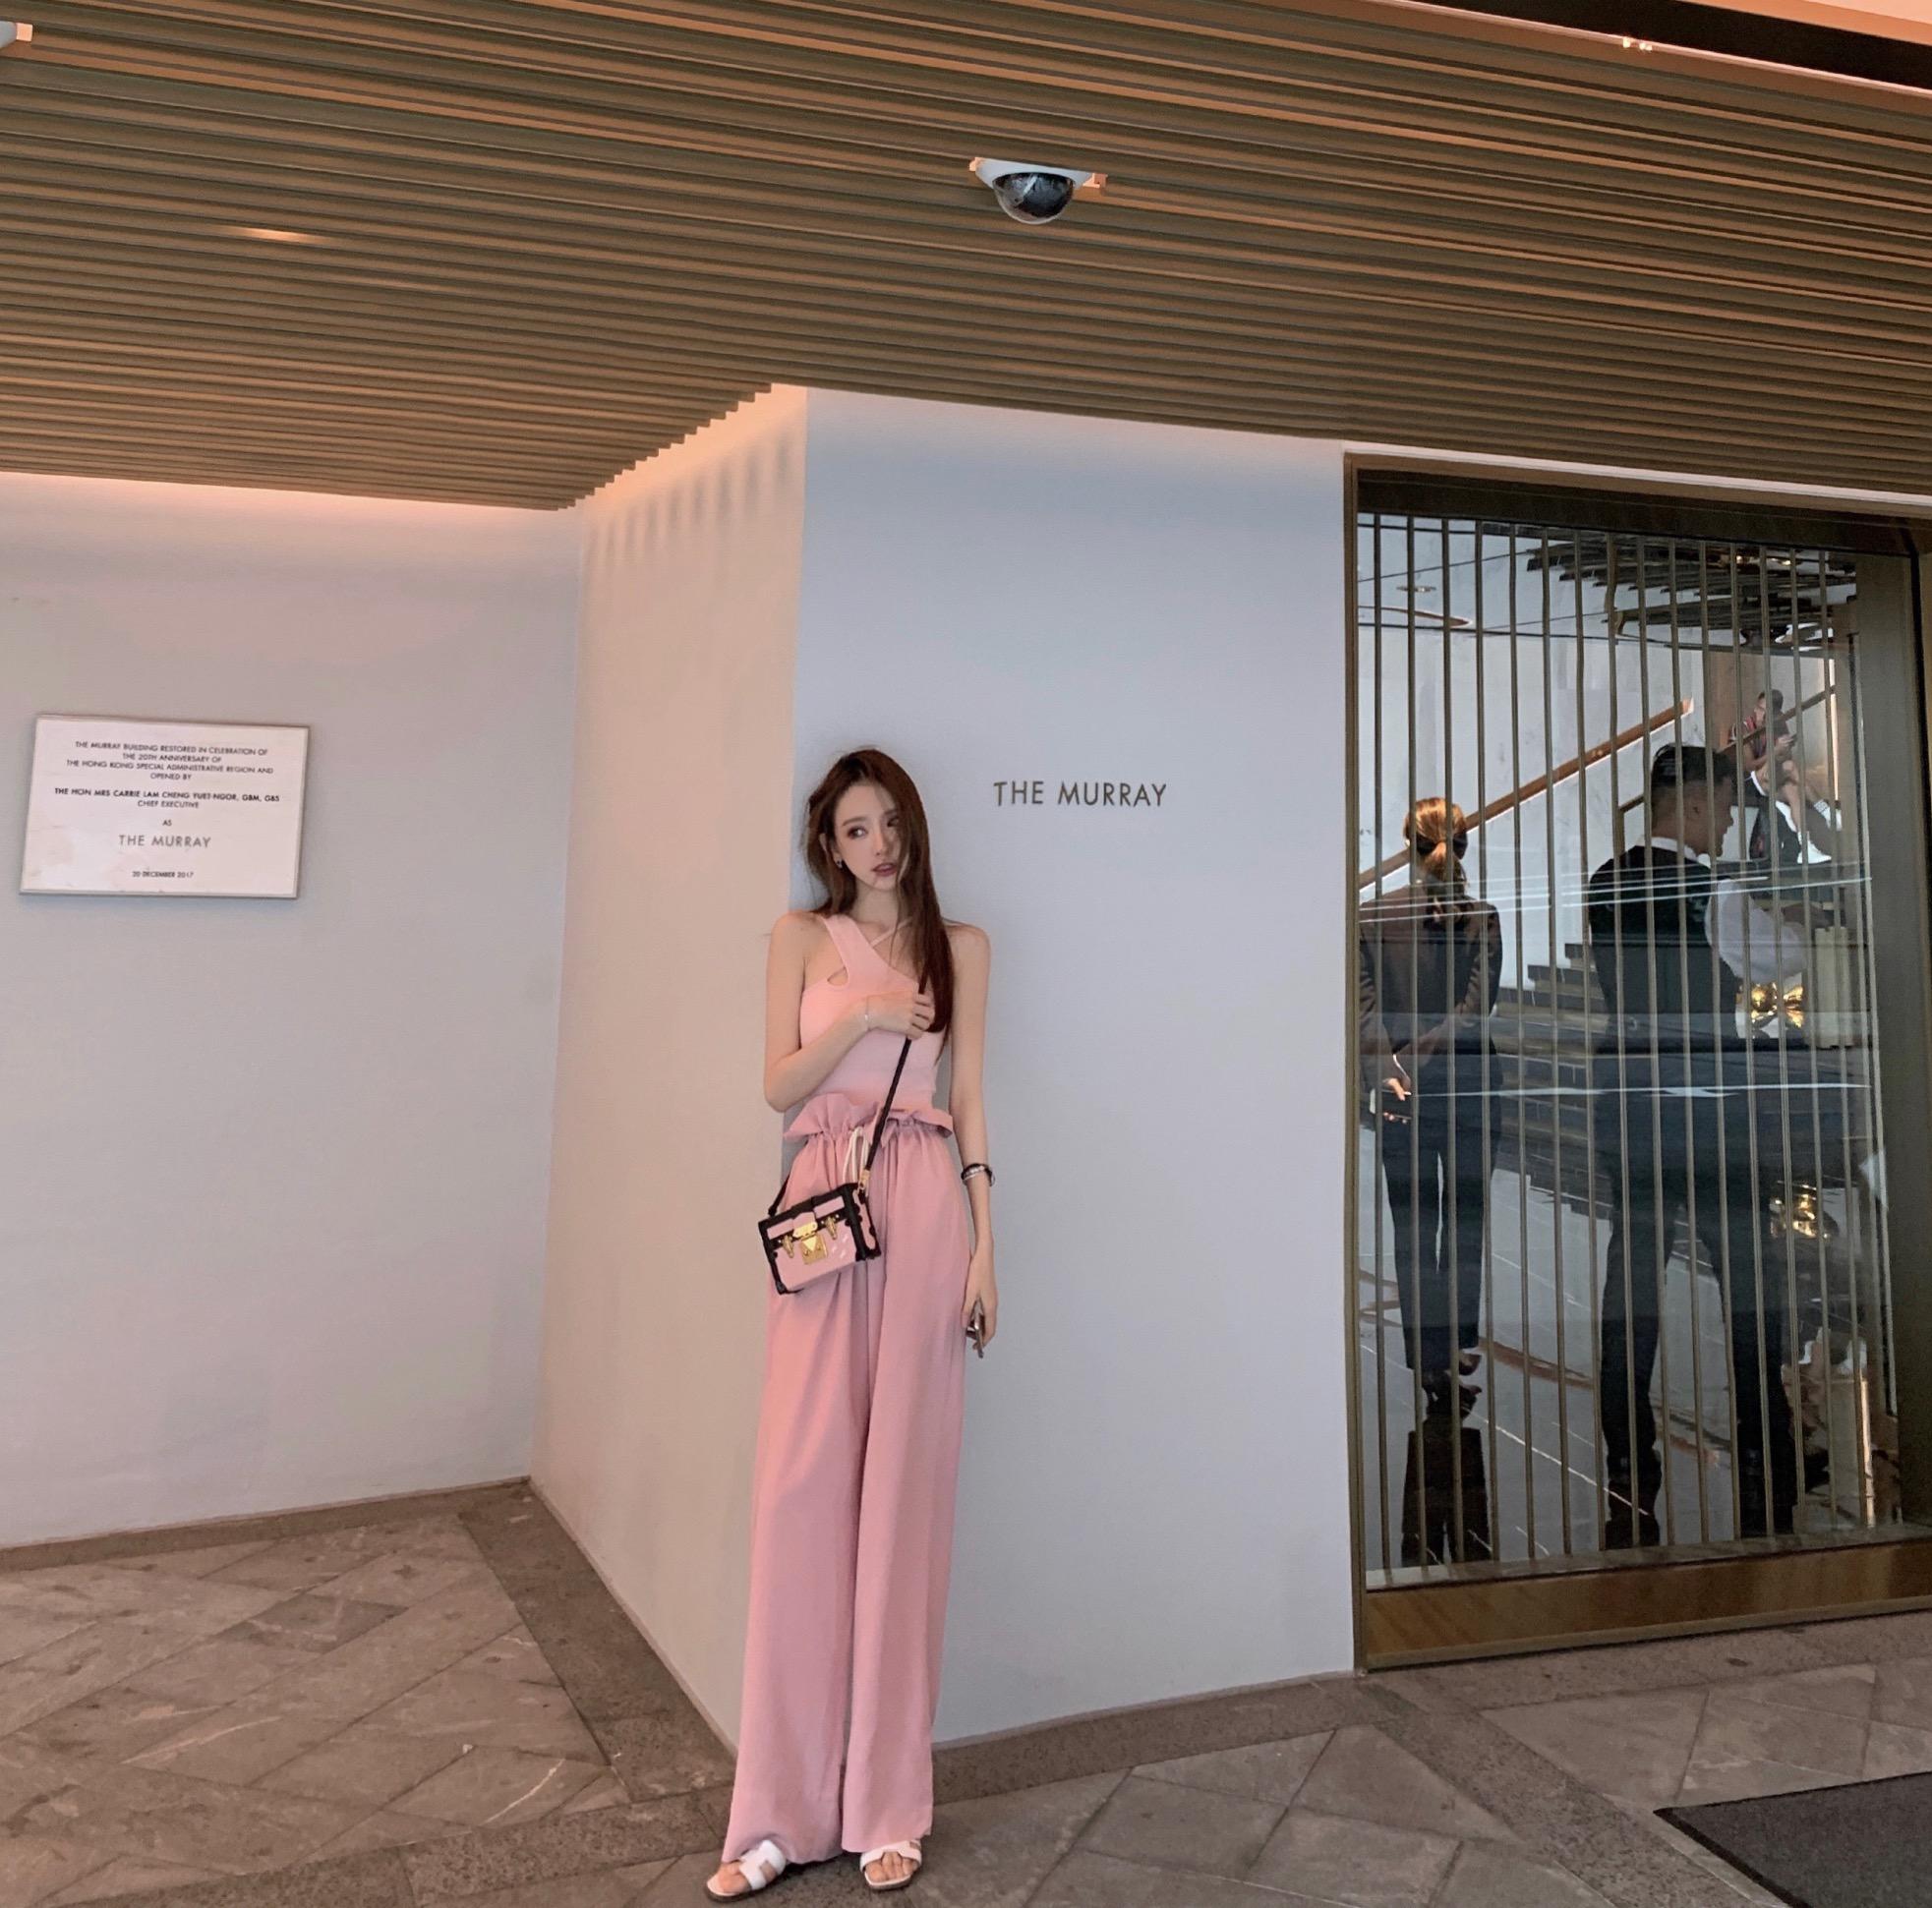 FBB李明萱2019夏季新款高腰直通花苞裤遮肉显瘦腿长休闲阔腿裤女 - 封面